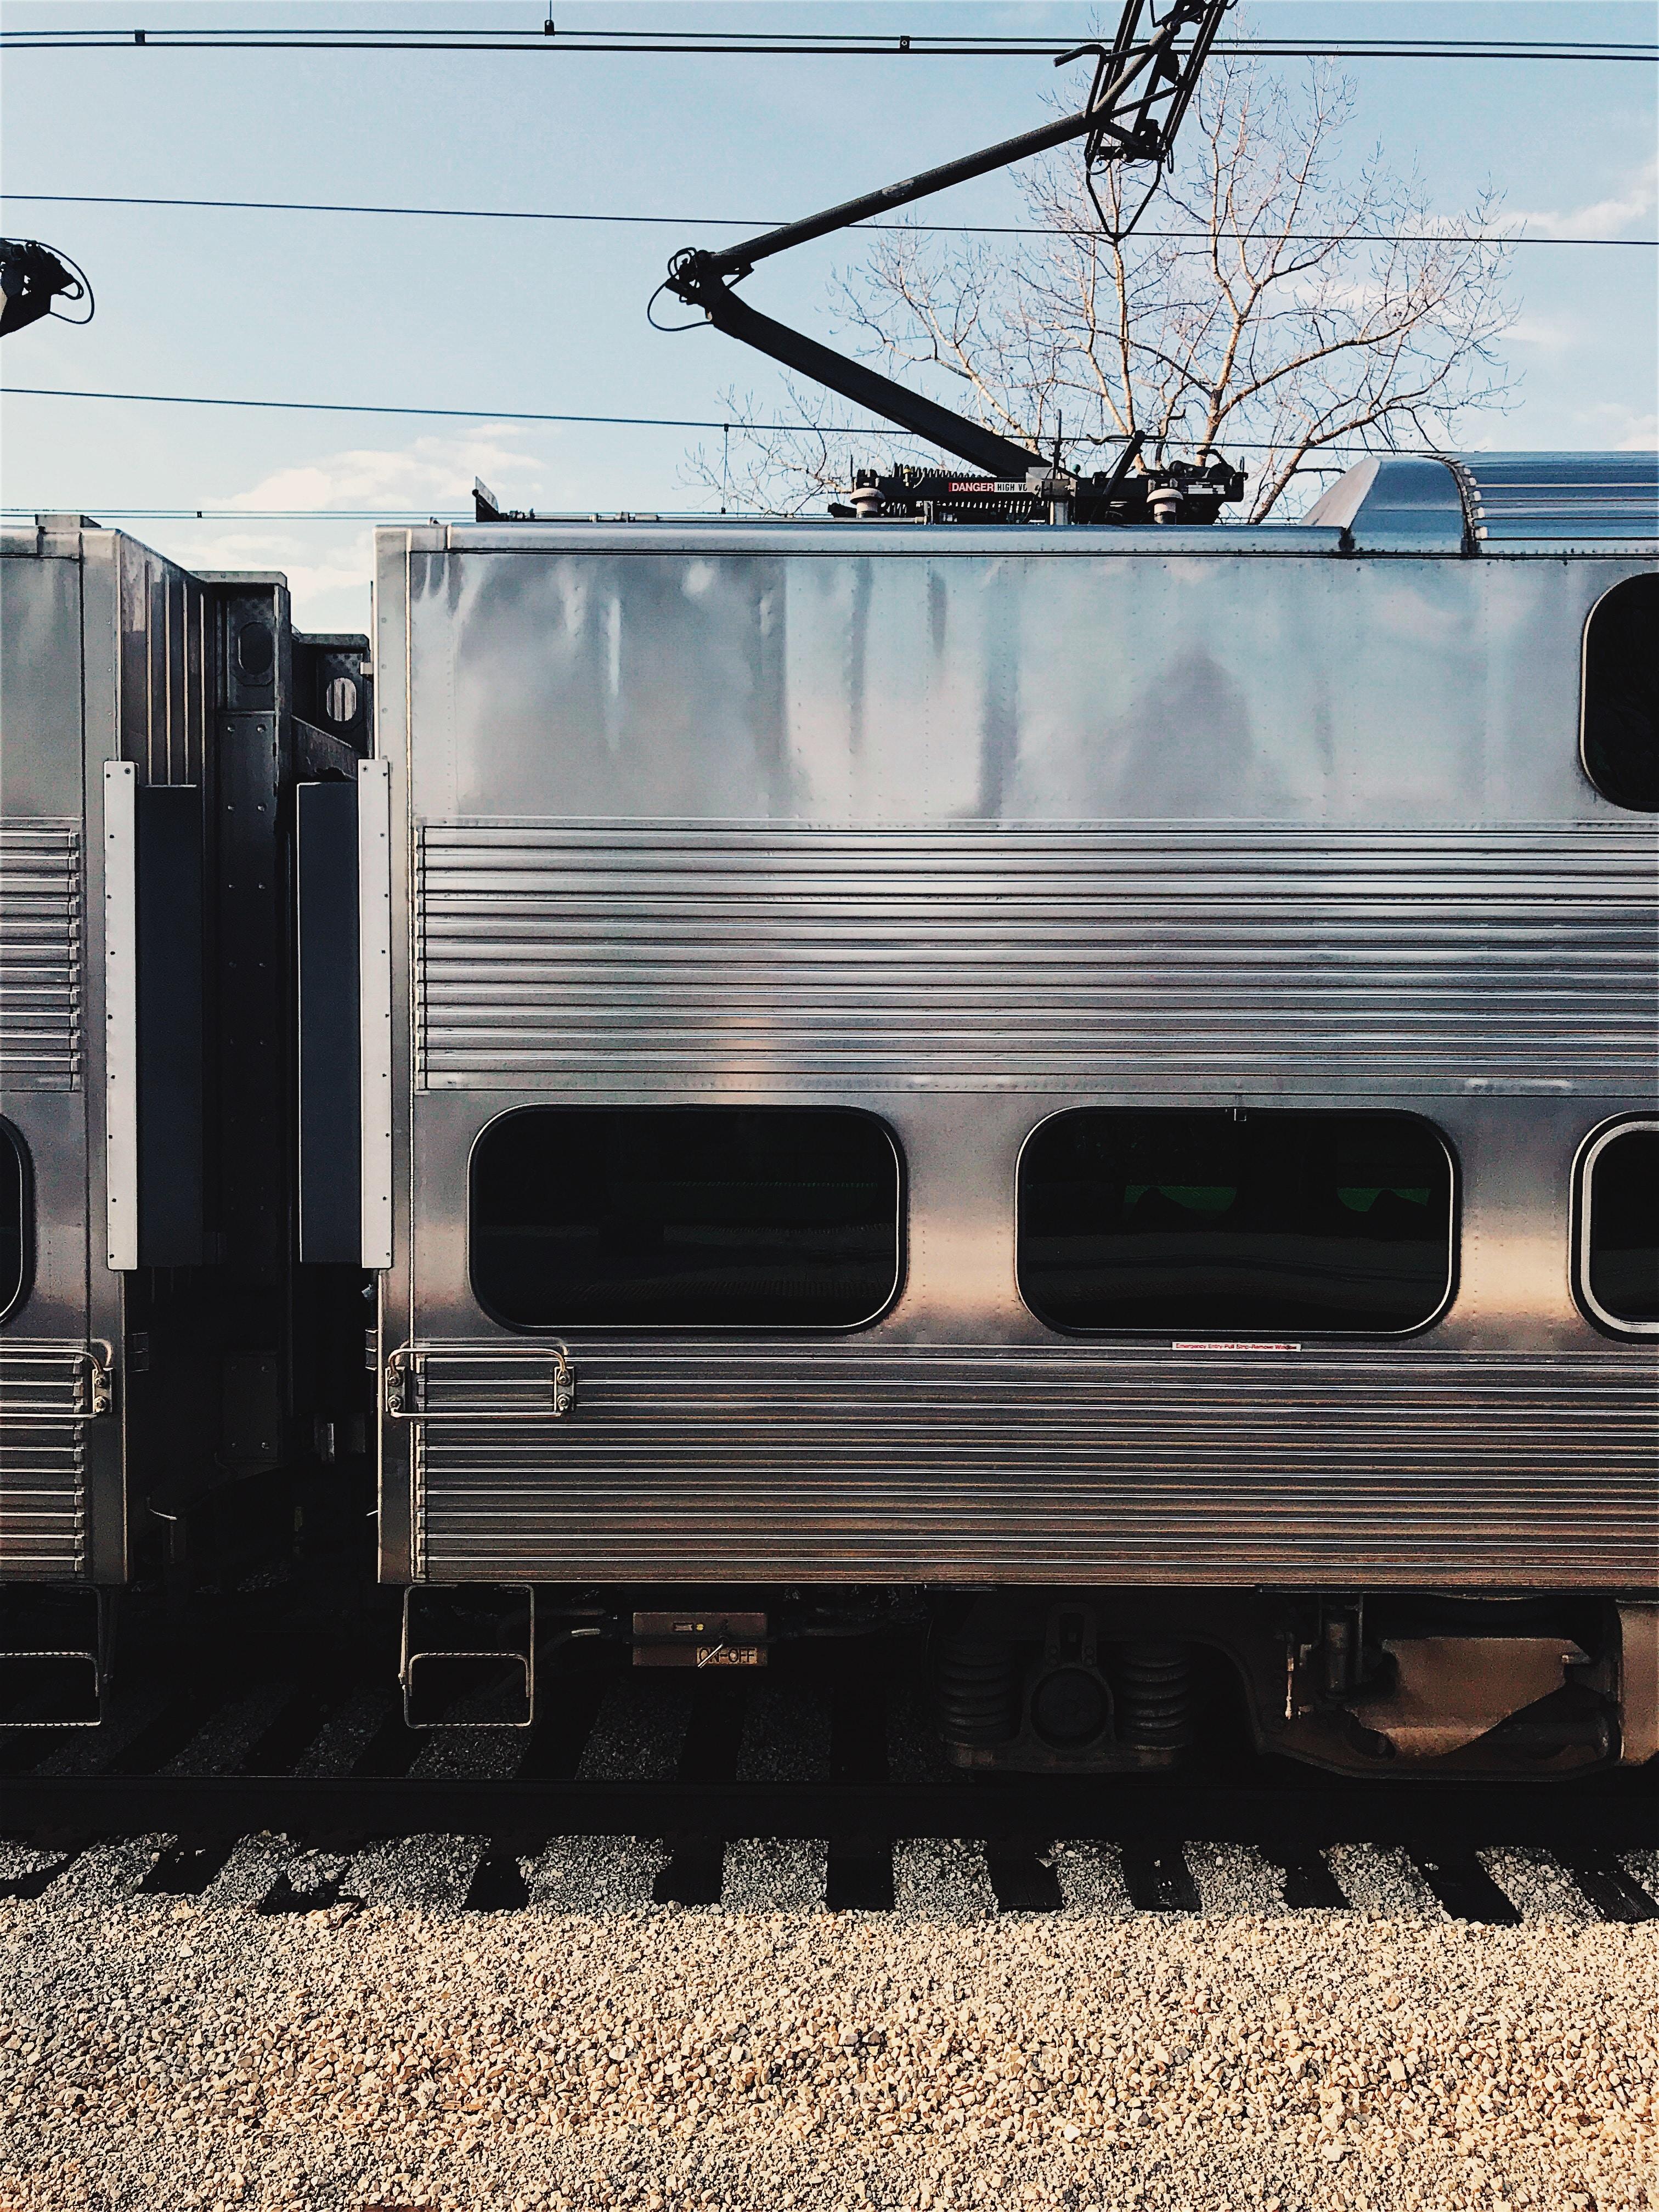 gray transit train